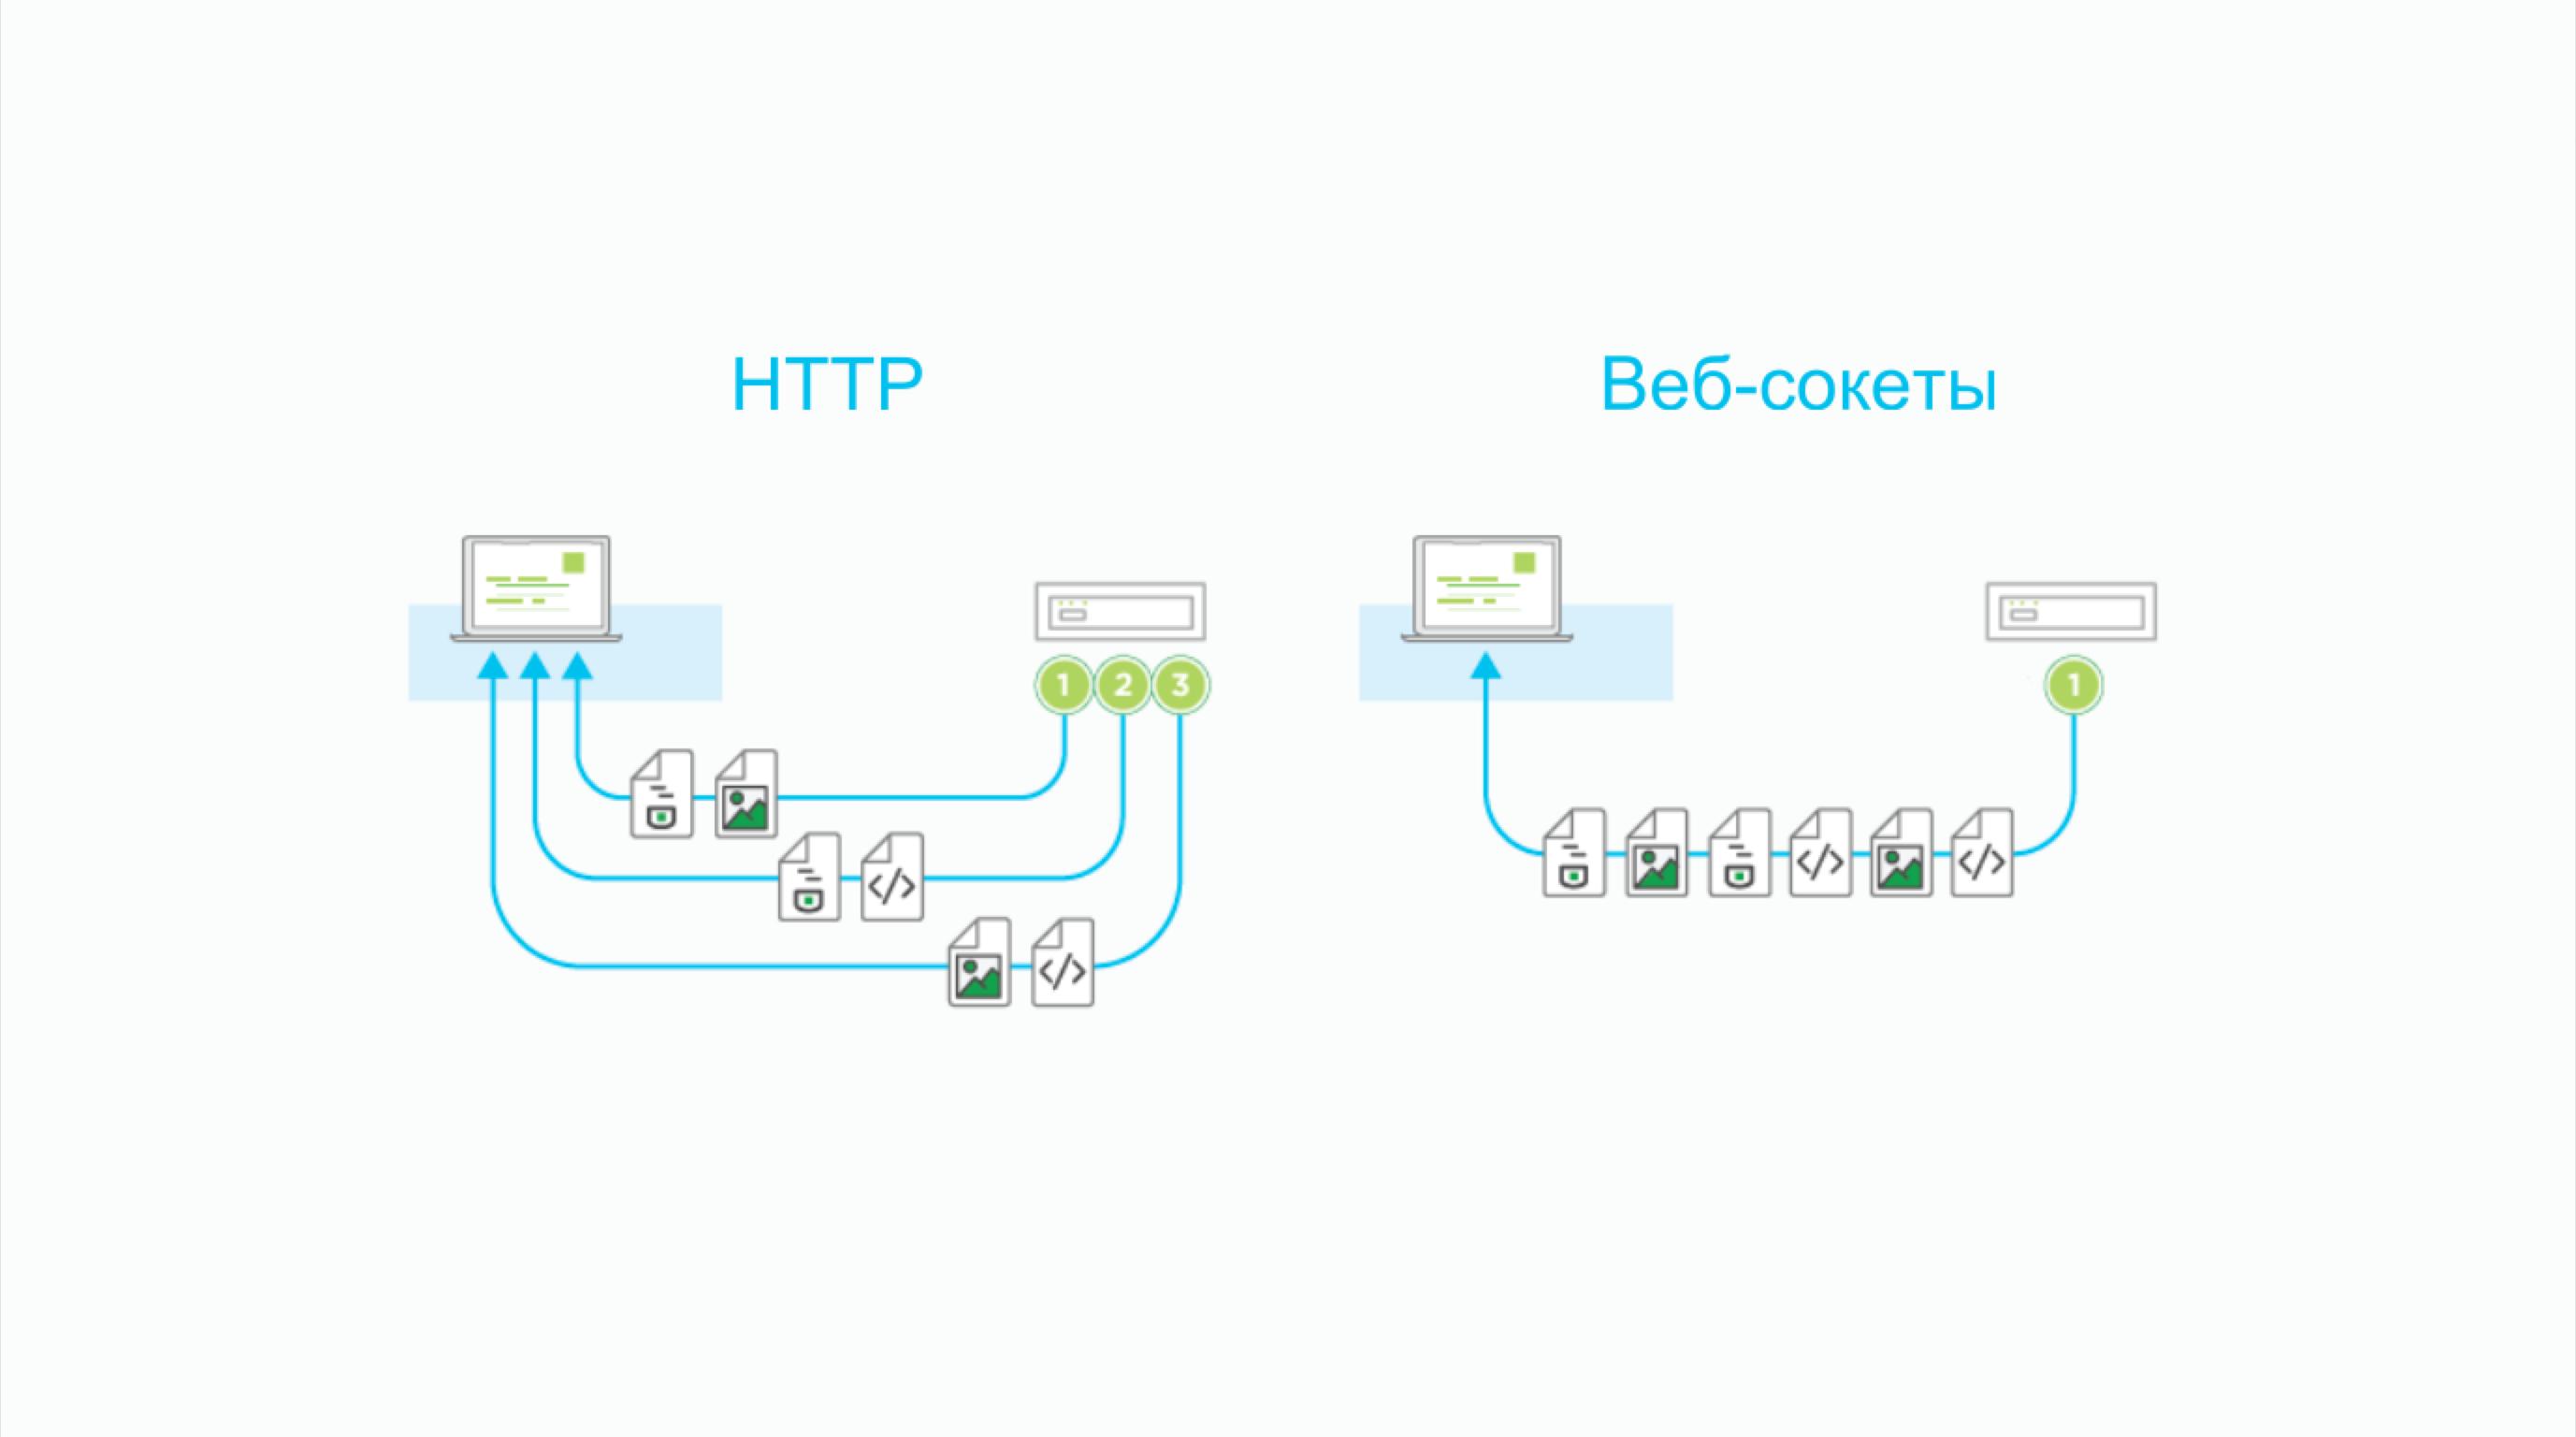 разница между http и web socket